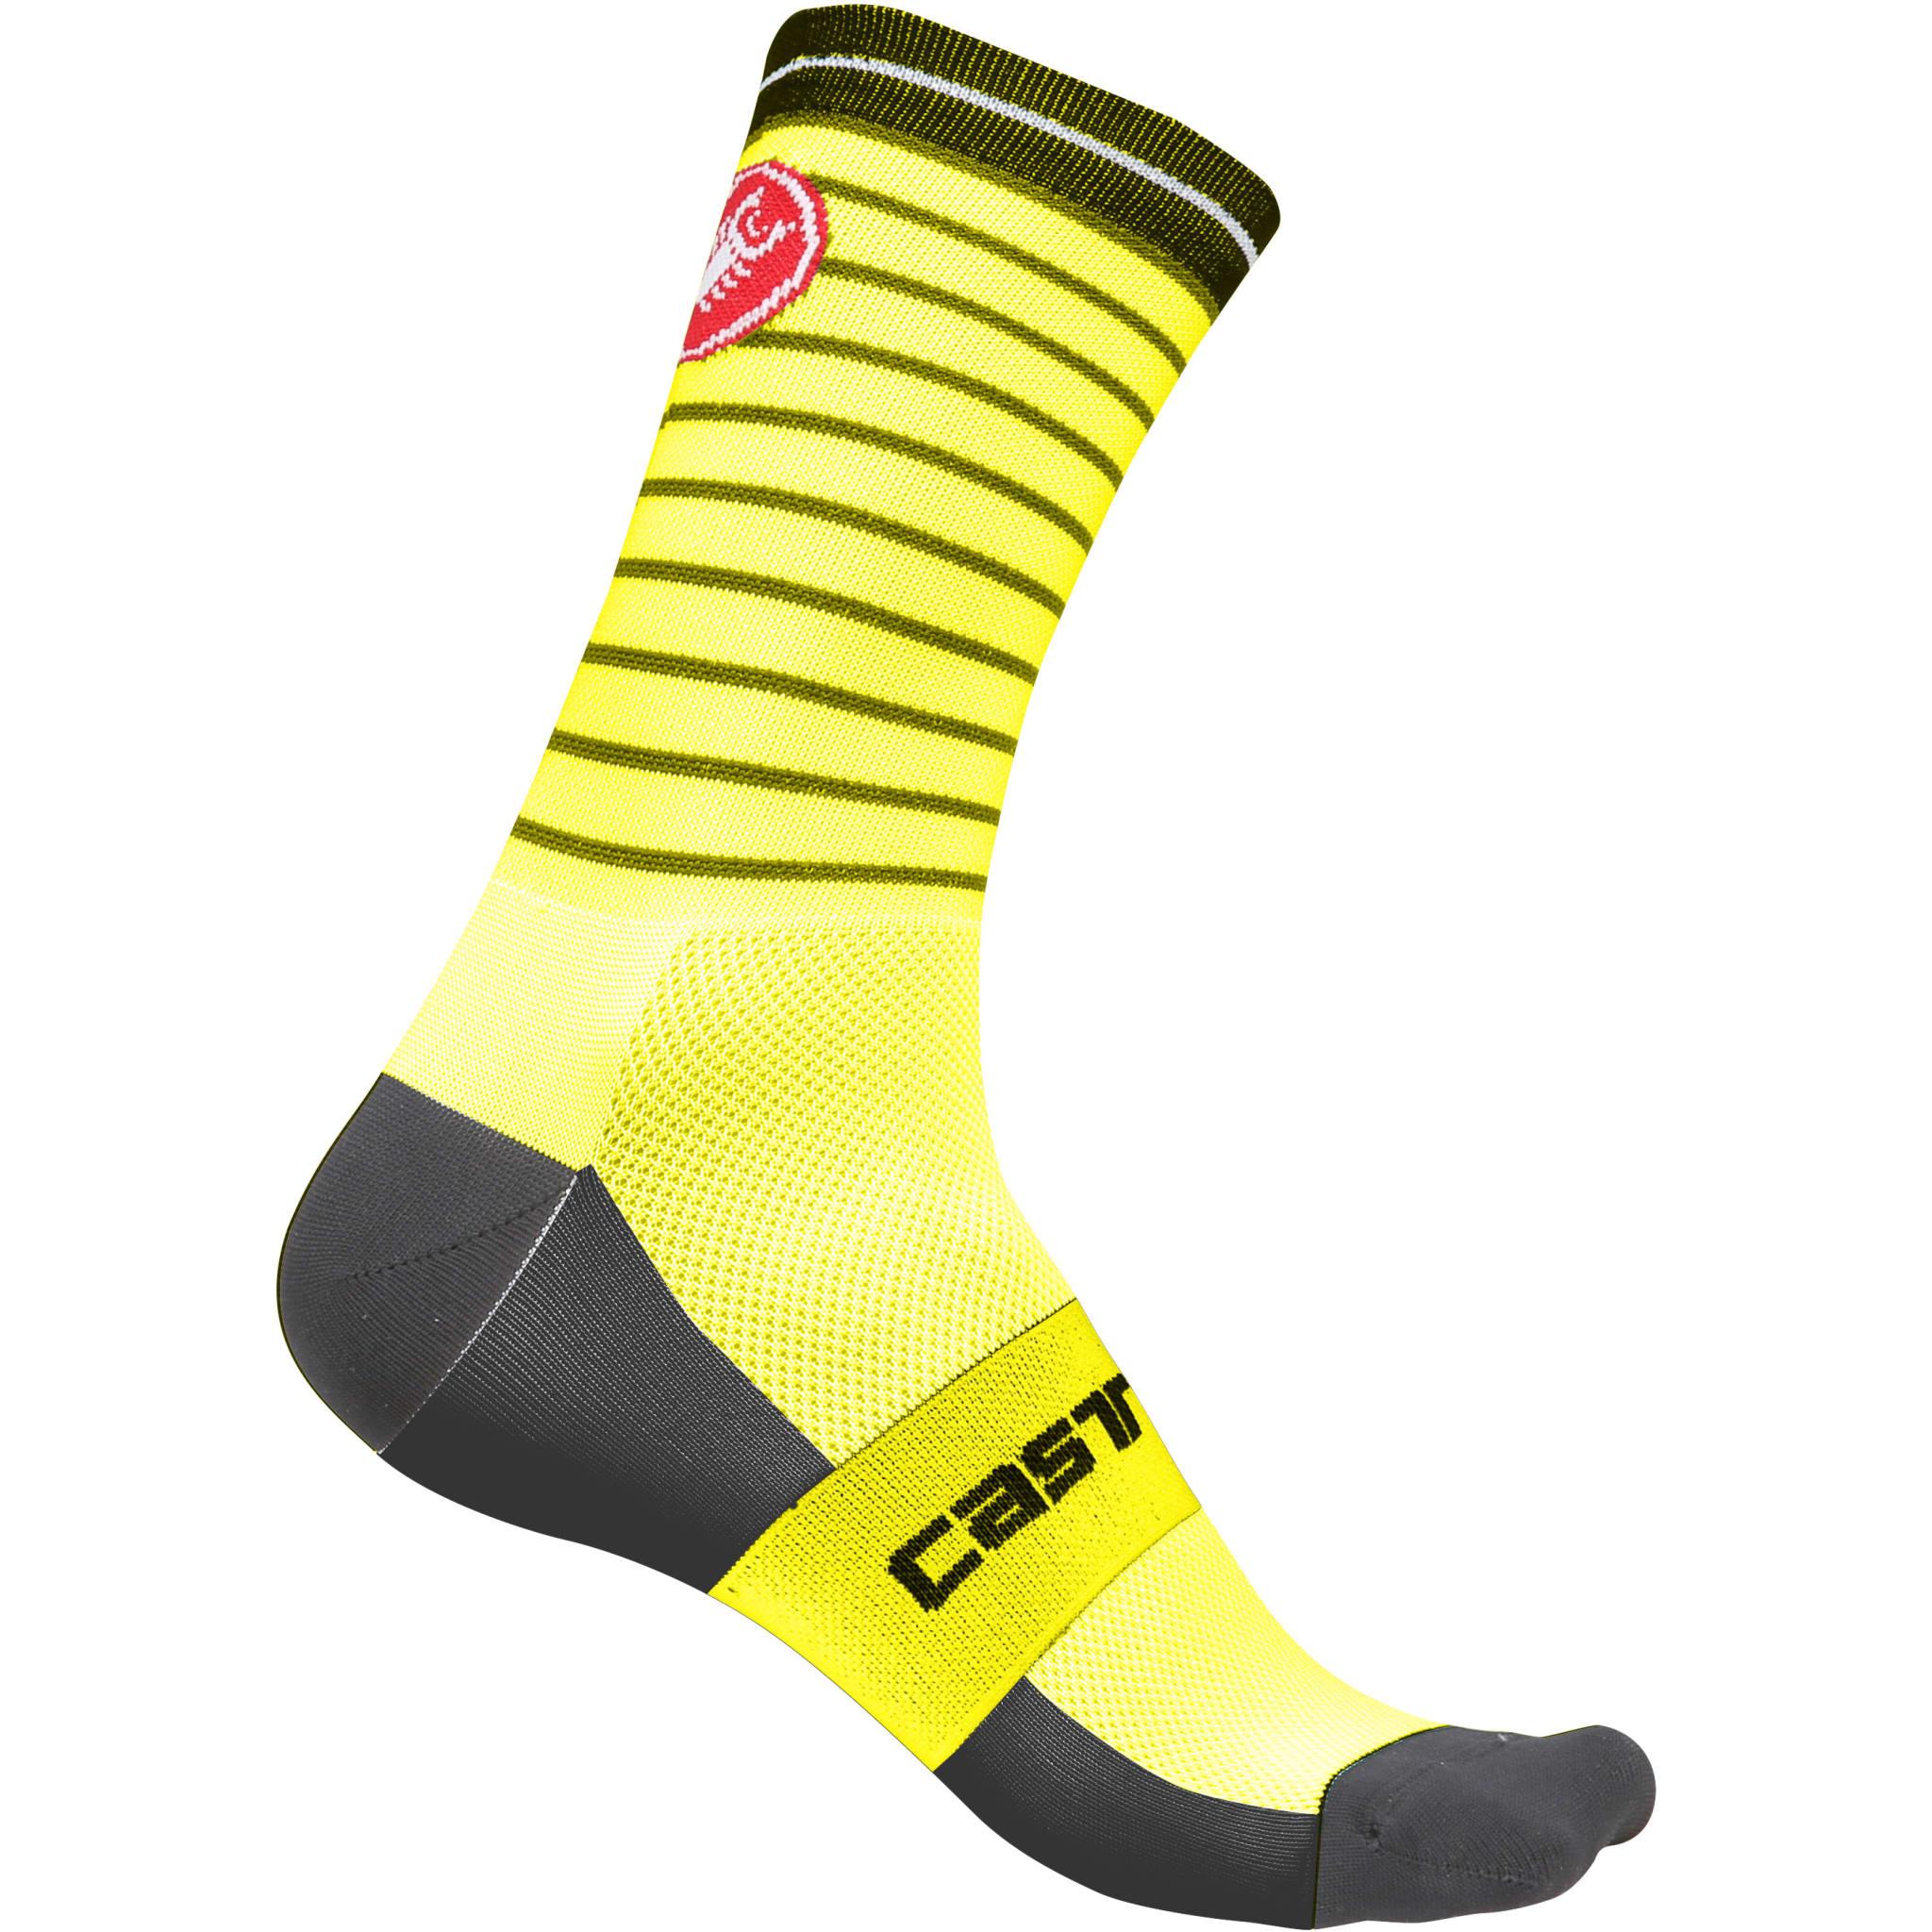 Podio Doppio 13 Sock